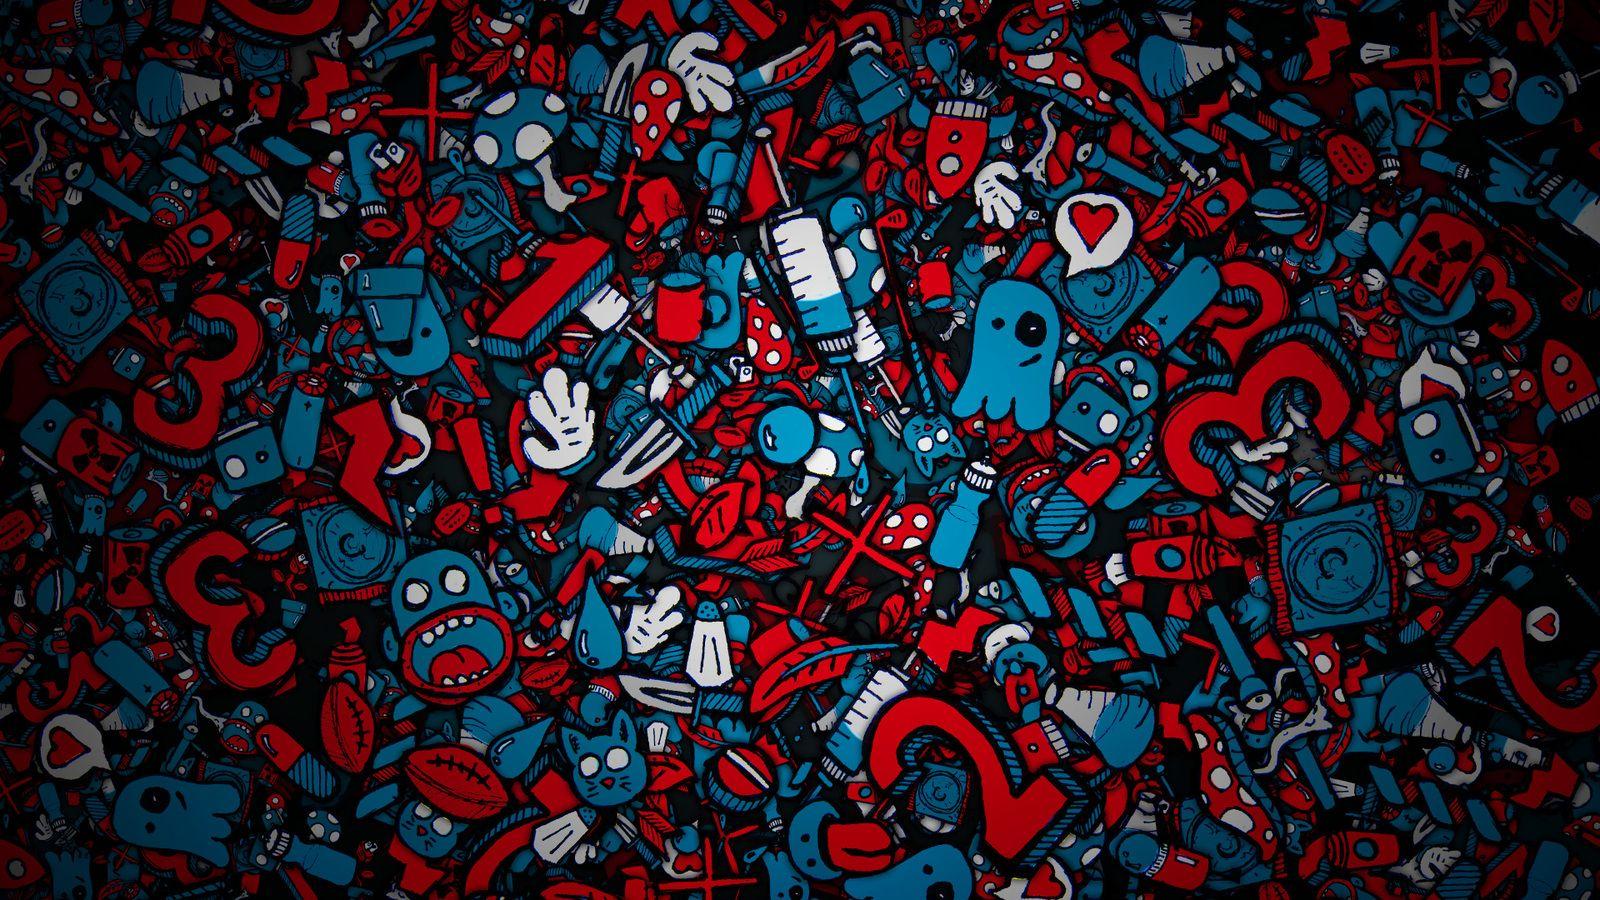 خلفيات كمبيوتر حجم كبير Hd Cool Wallpapers Cool Desktop Backgrounds Graffiti Wallpaper